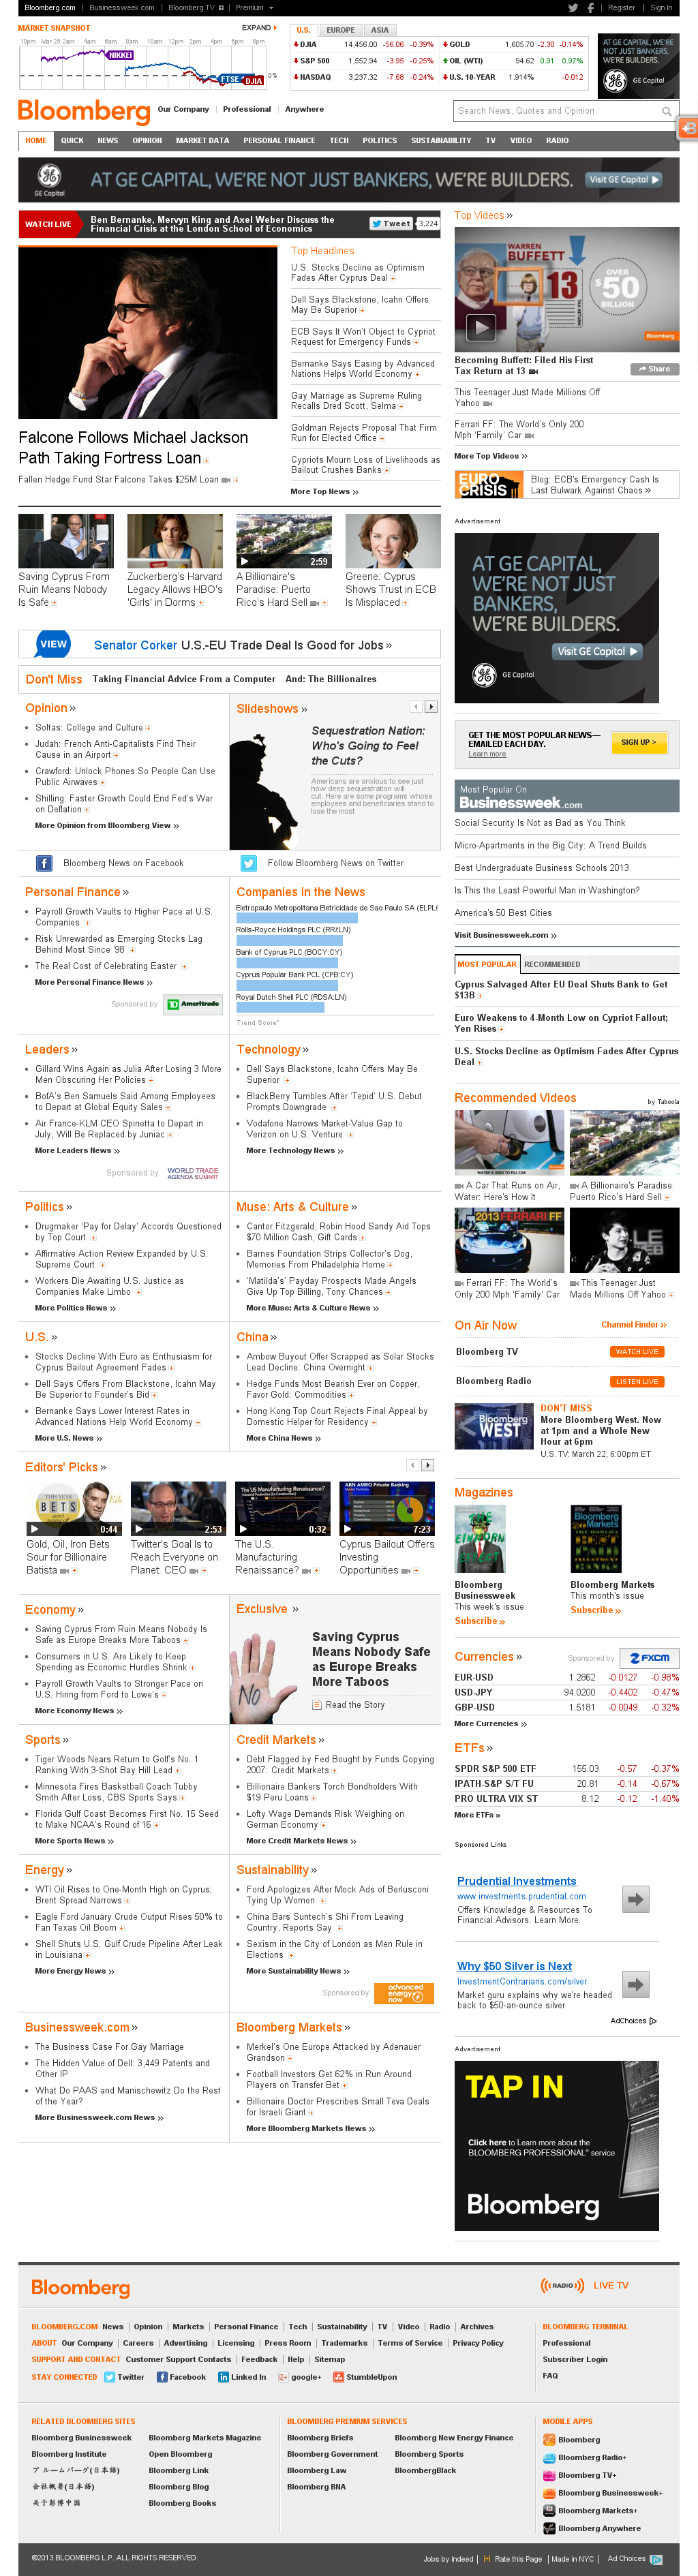 Bloomberg at Monday March 25, 2013, 7:03 p.m. UTC